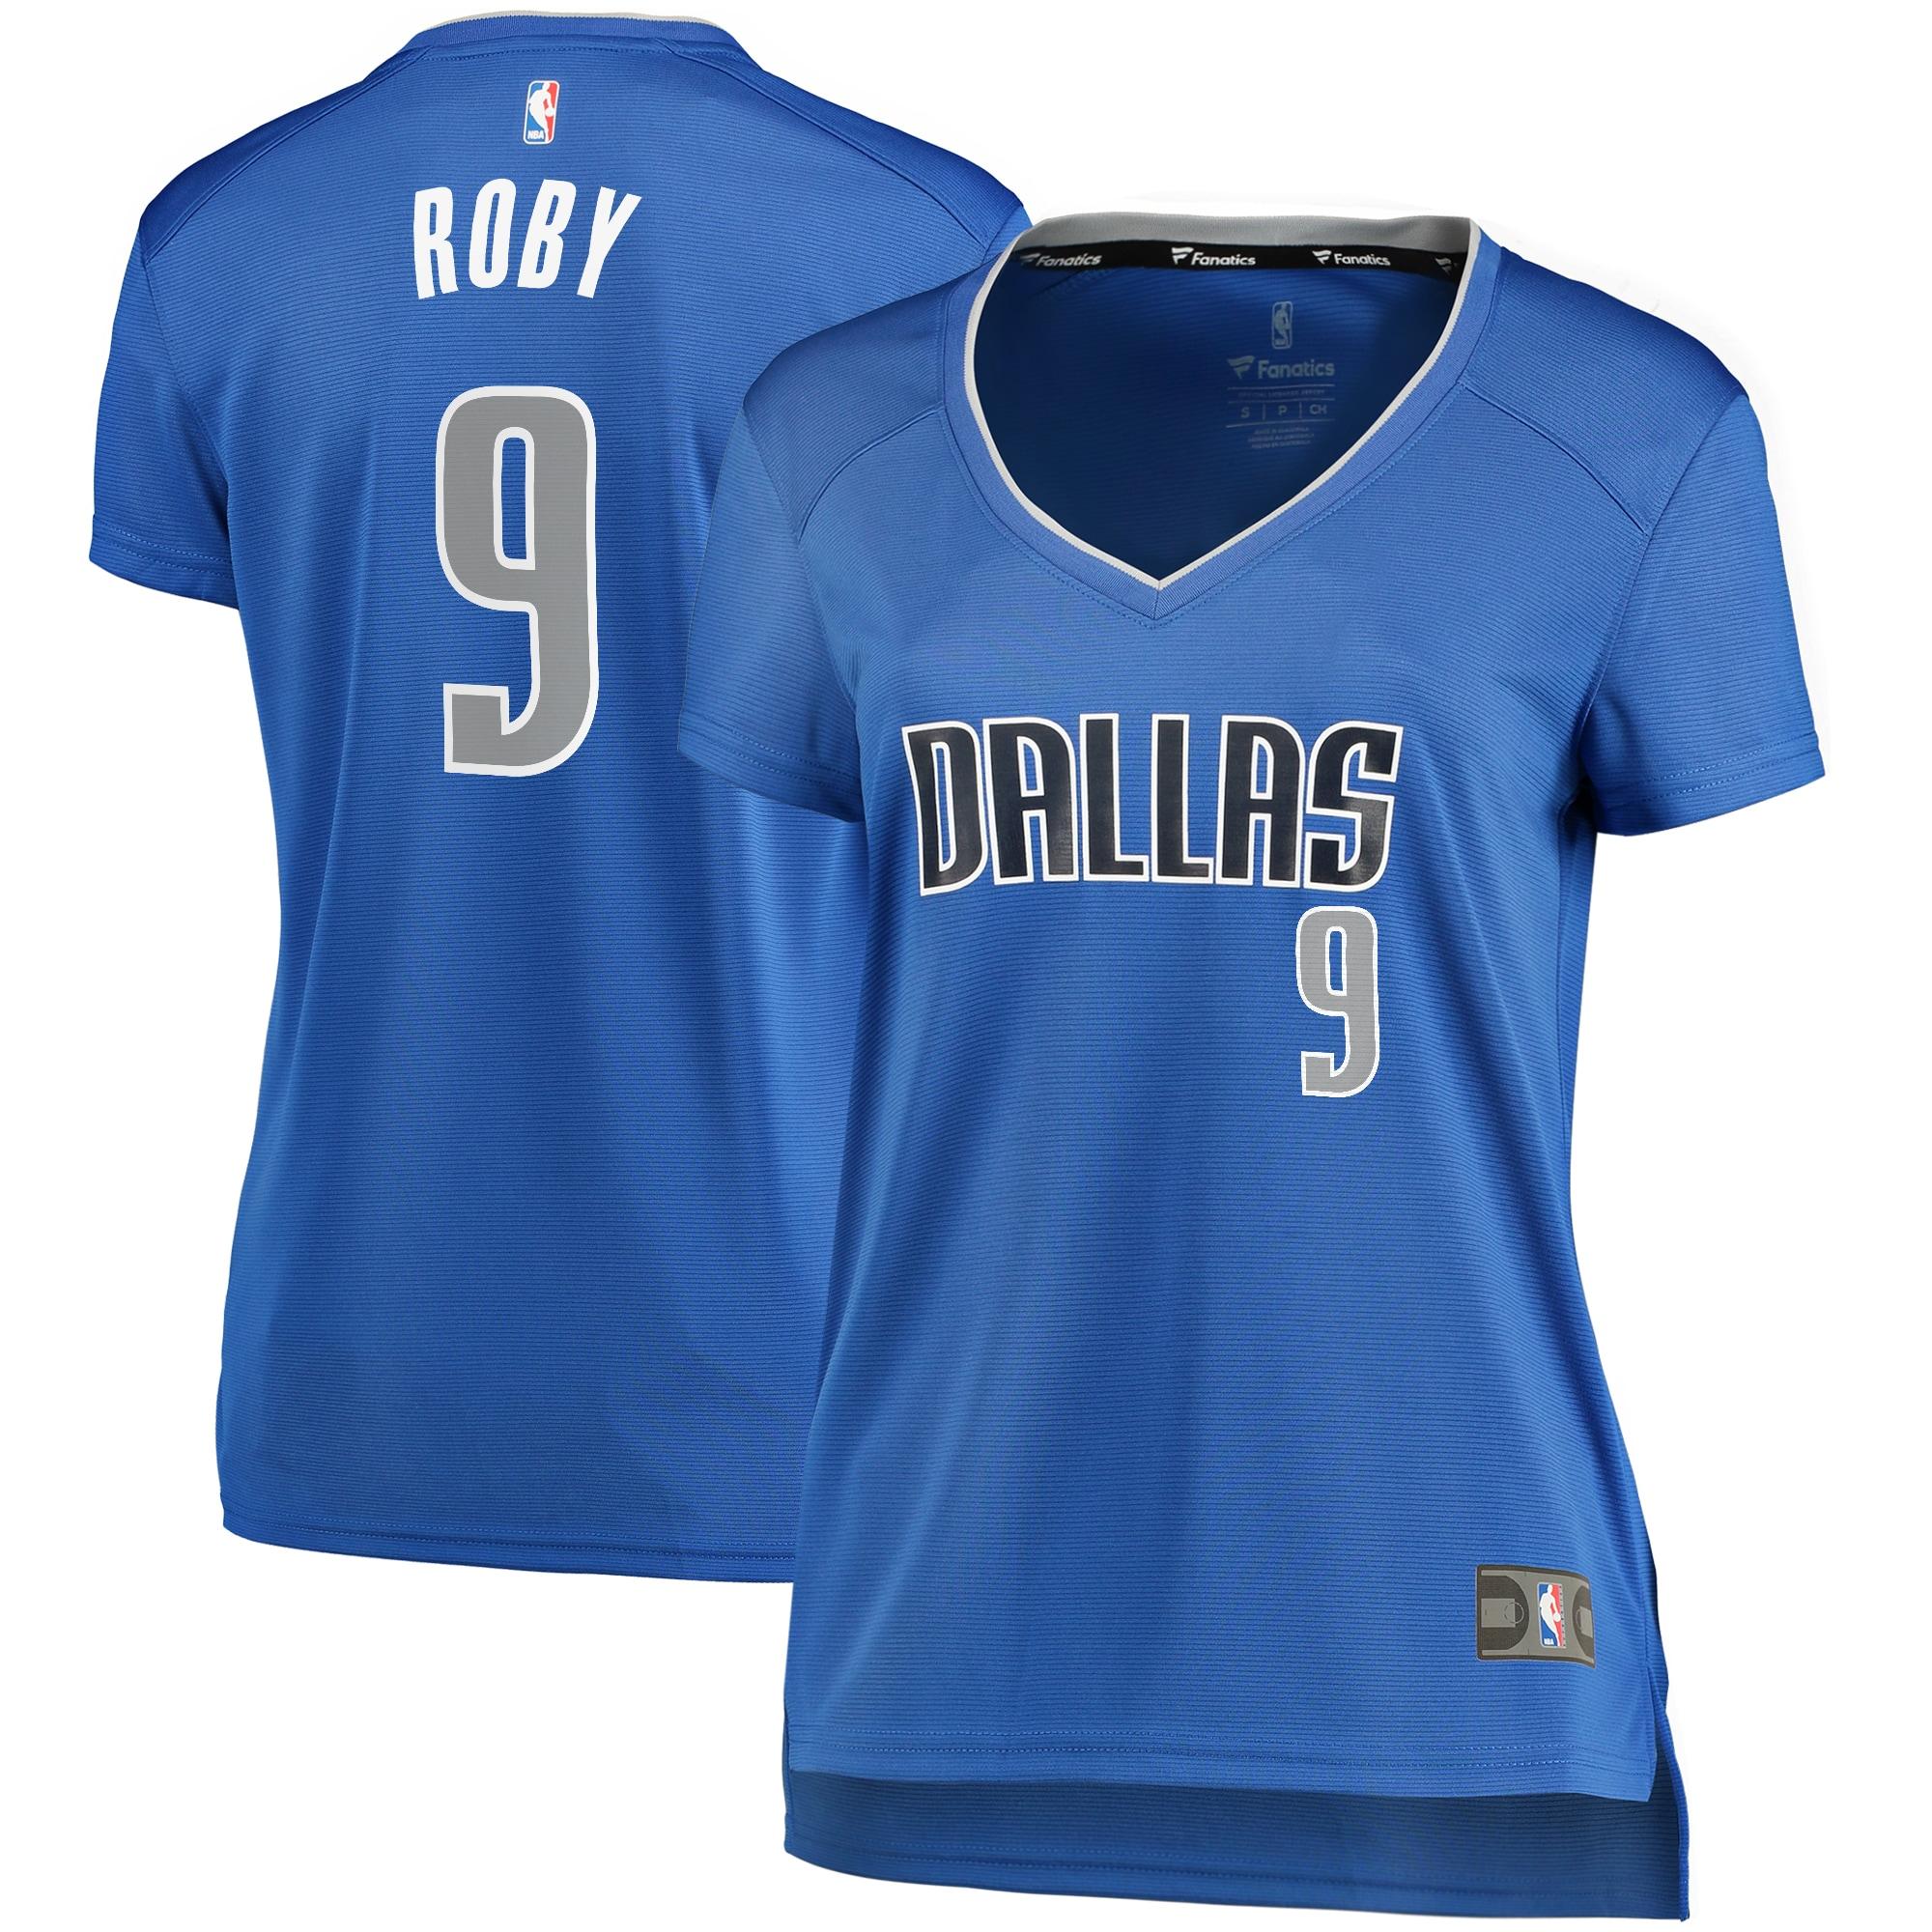 Isaiah Roby Dallas Mavericks Fanatics Branded Women's Fast Break Replica Player Jersey - Icon Edition - Blue